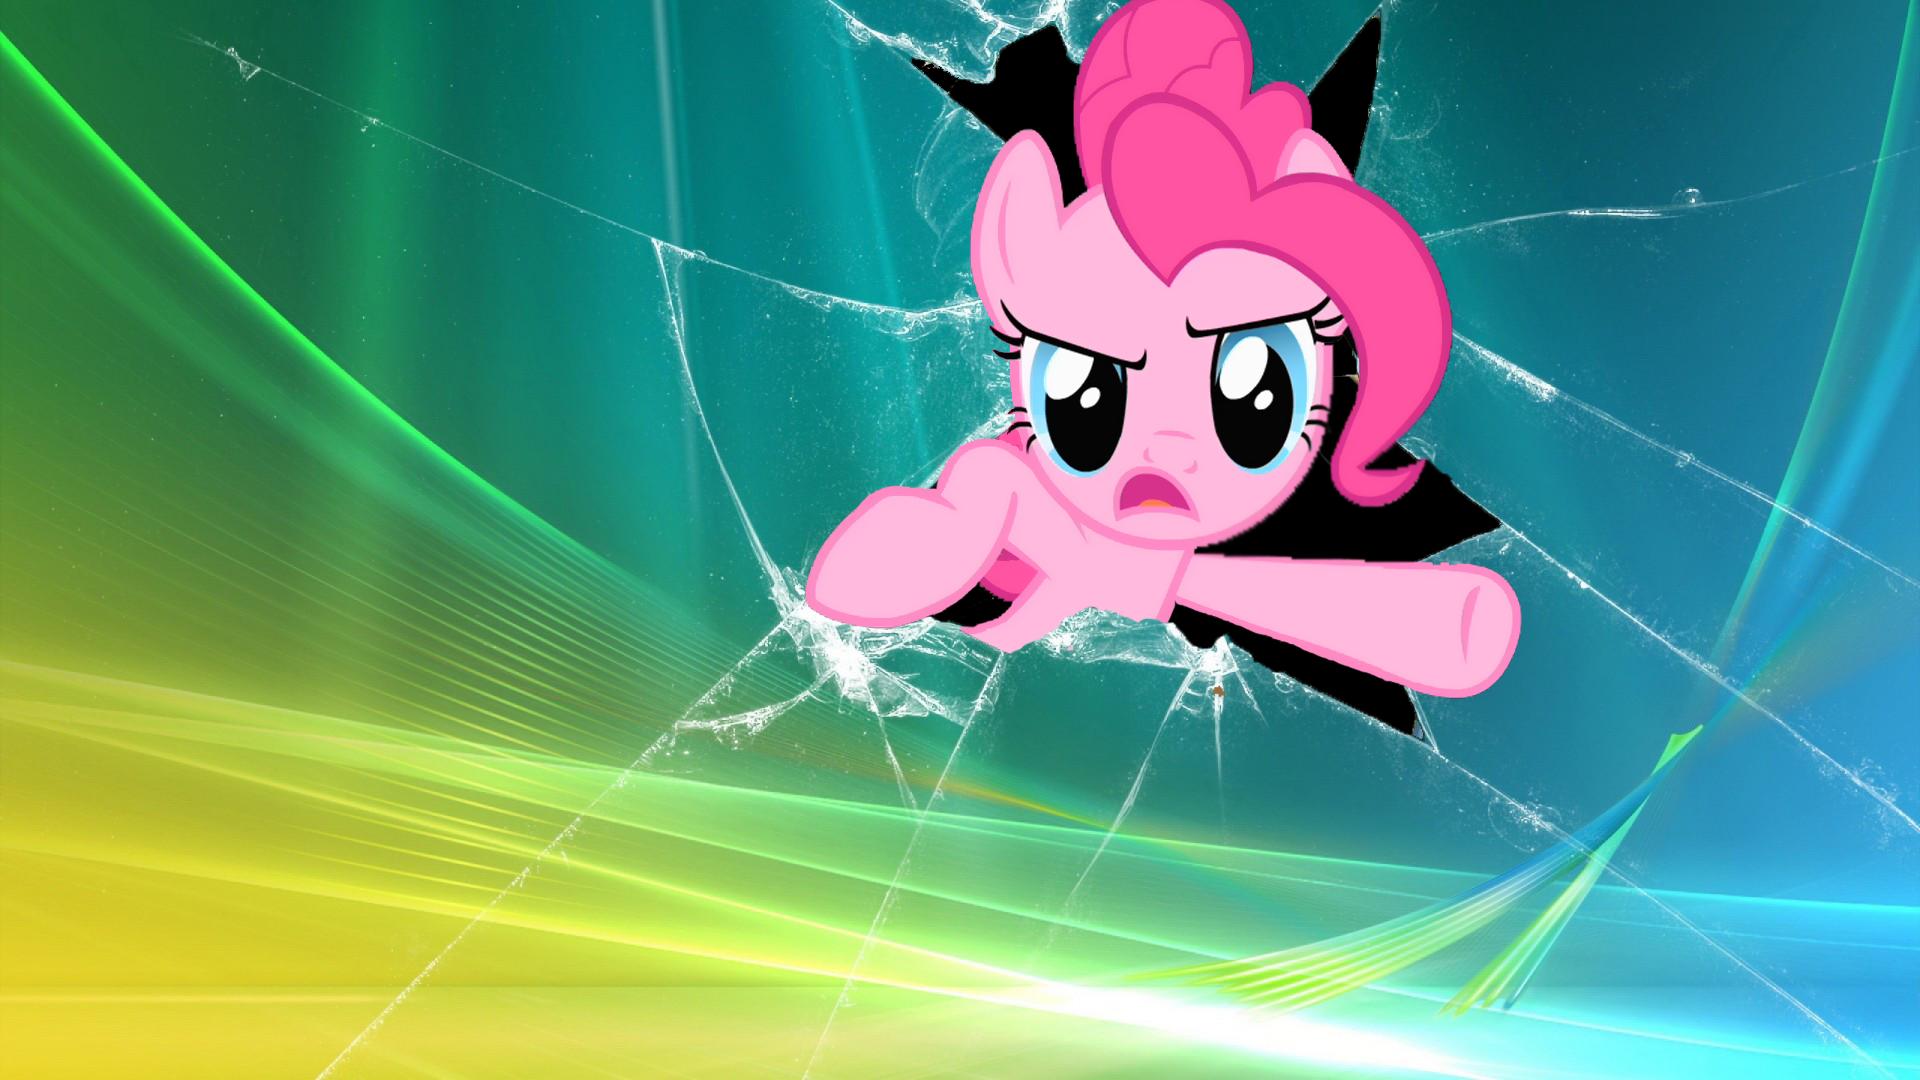 ForhavuCraft's *OFFICIAL* My Little Pony: FiM Thread! 24815%20-%20pinkie_pie%20wallpaper